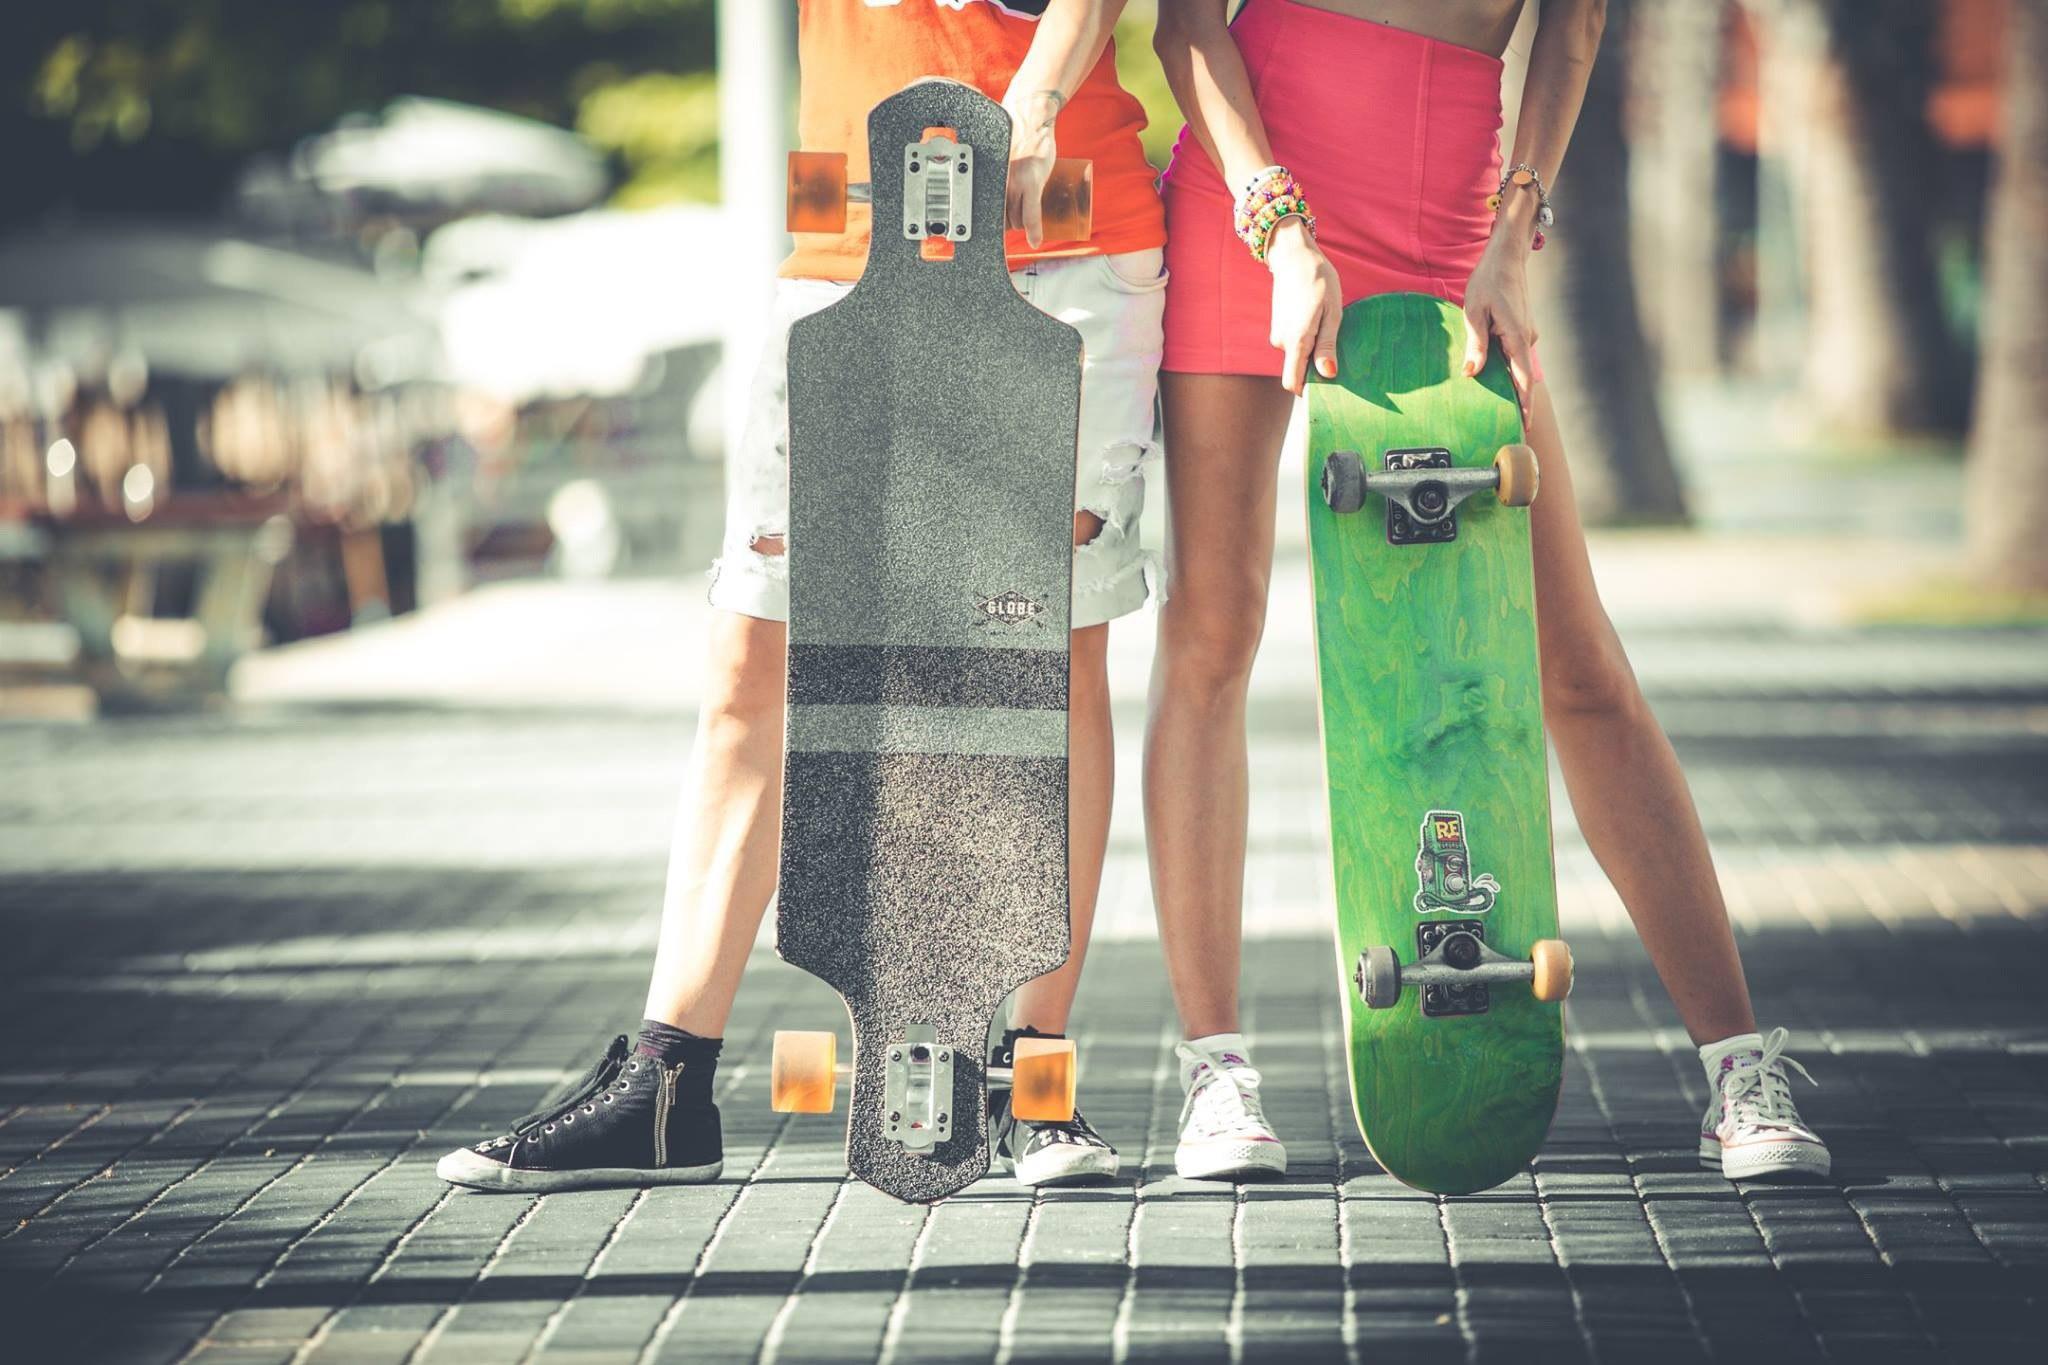 143160 скачать обои Скейт, Скейтборд, Спорт, Хобби, Лонгборд, Доска - заставки и картинки бесплатно